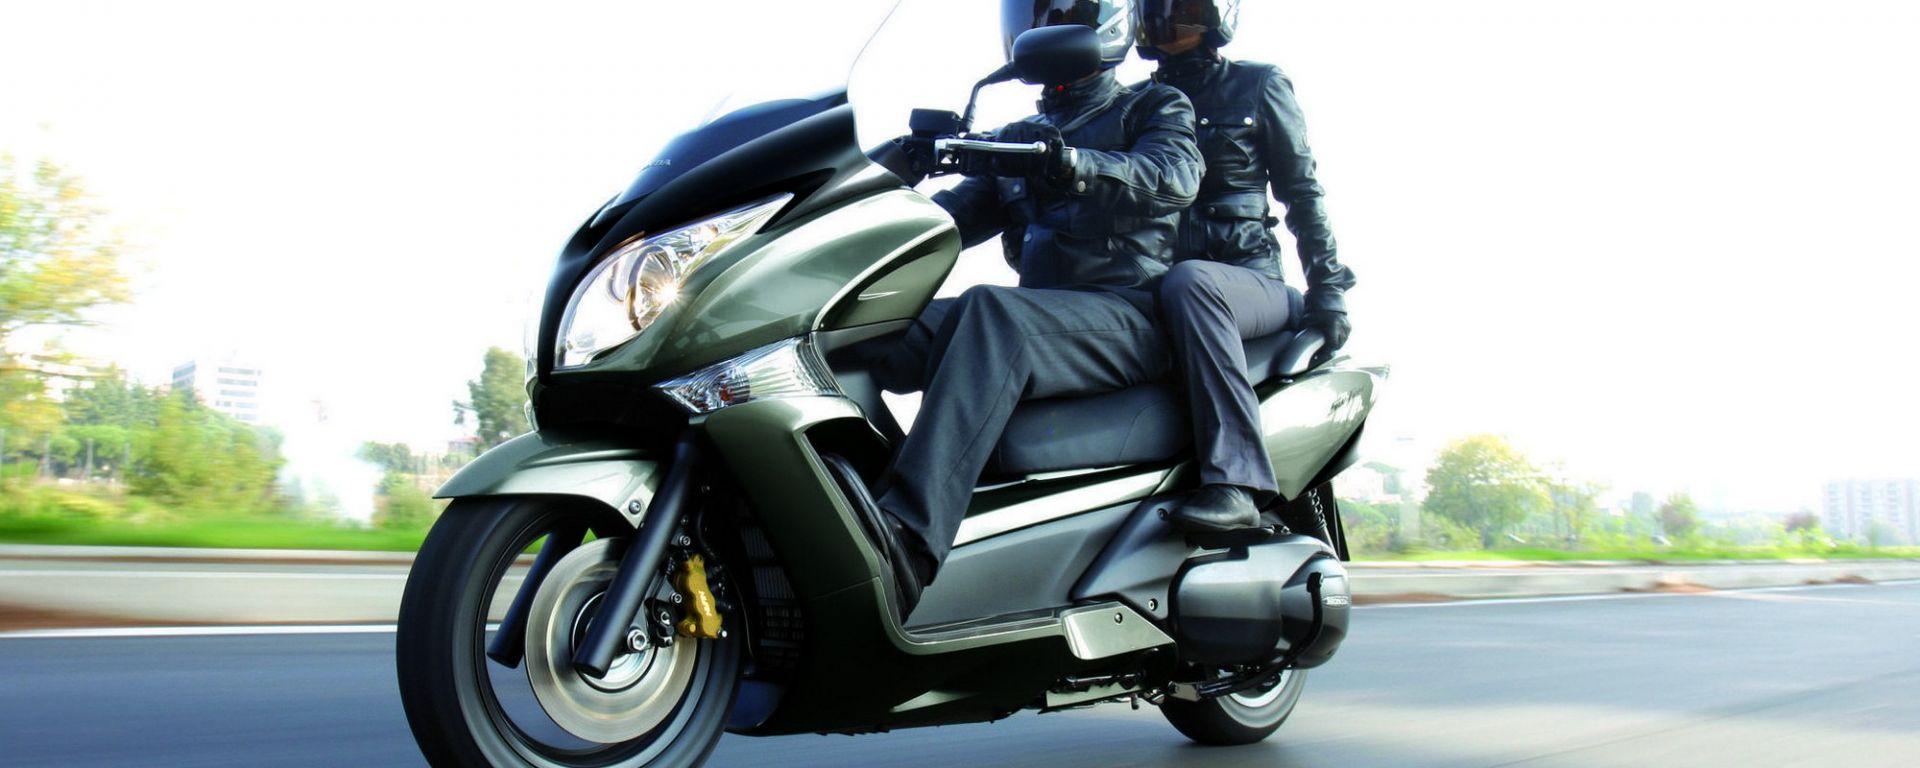 Honda SW-T600 ABS